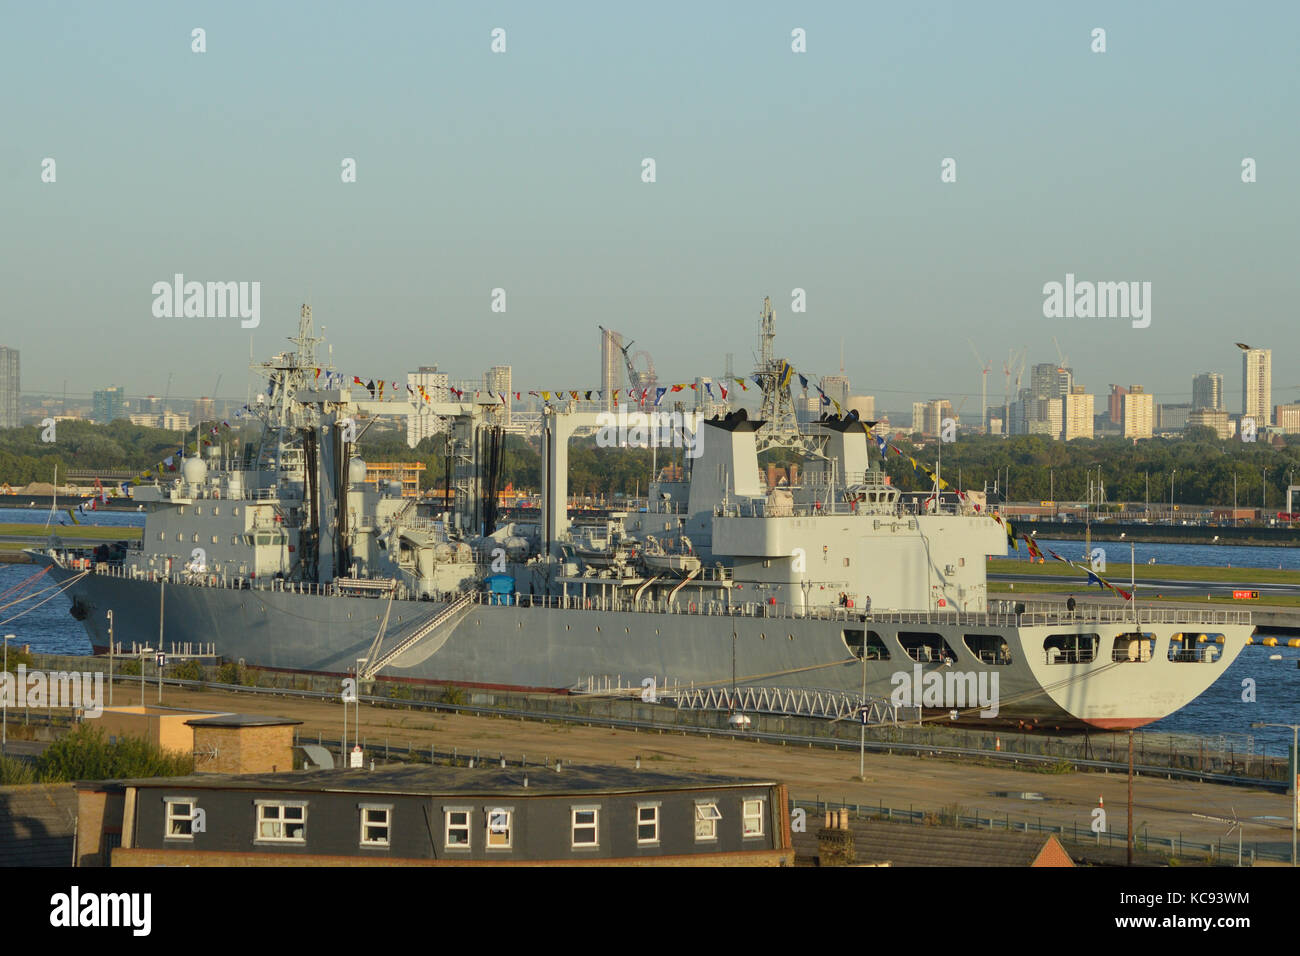 Navire de ravitaillement de la Marine chinoise AOR 966 Gaoyouhu PLAN amarrés dans le King George V Dock in Photo Stock